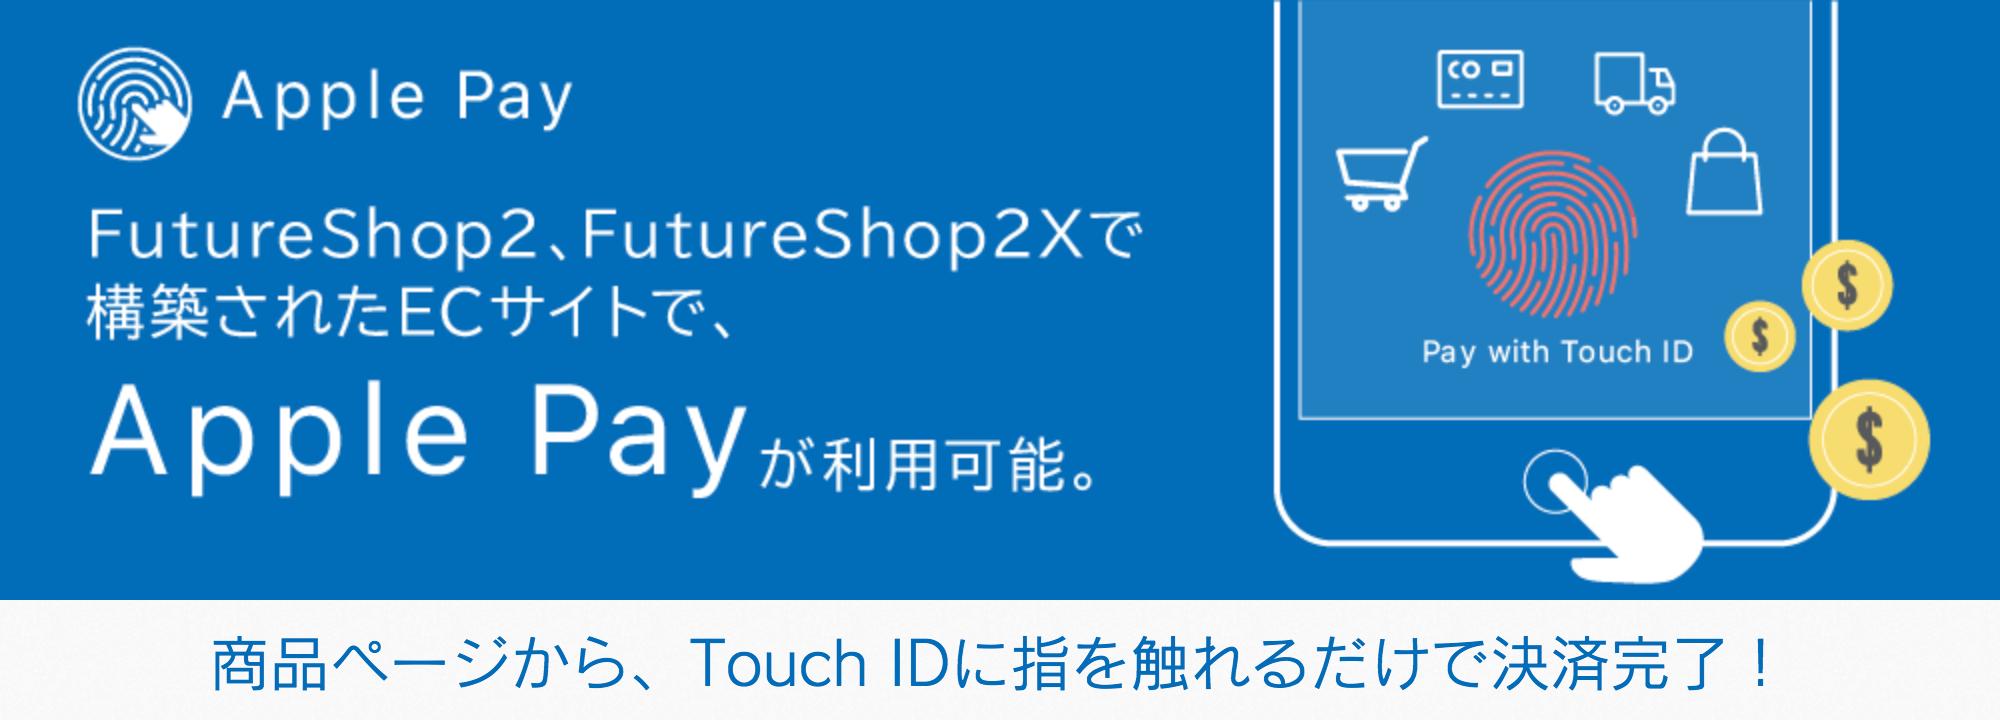 FutureShop2・ApplePay